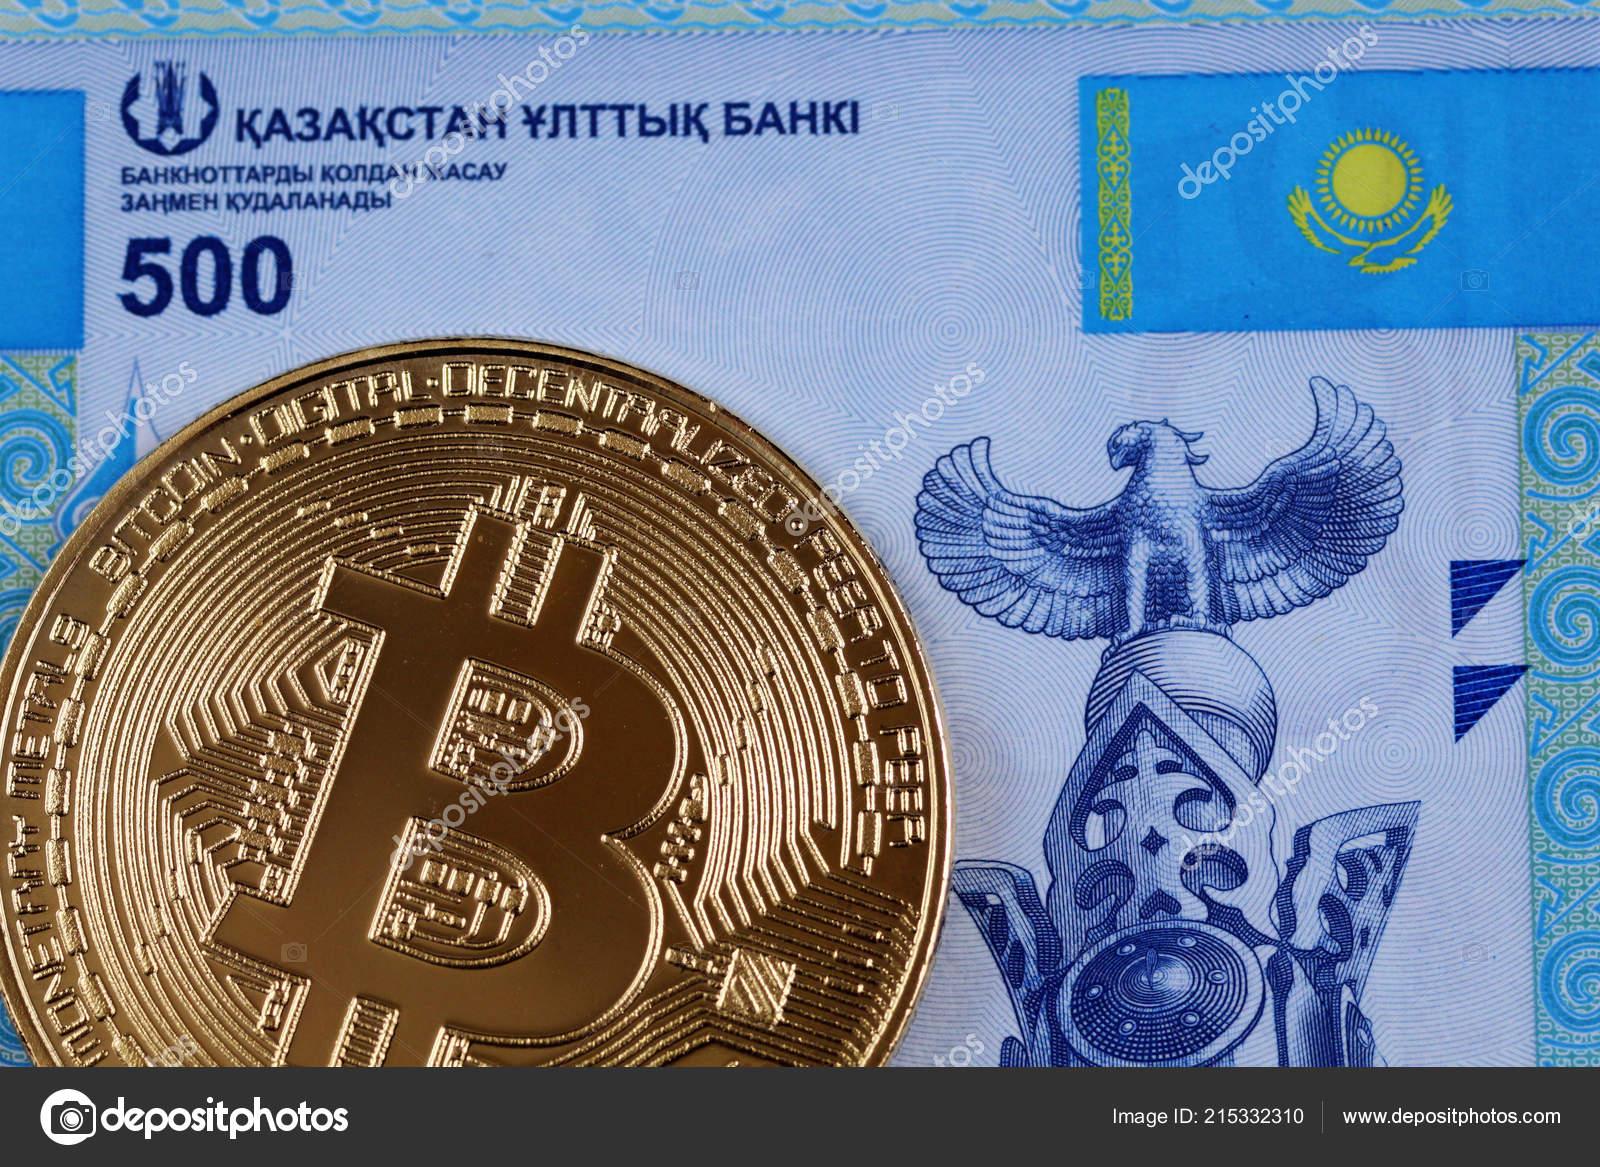 Kzt (tenakh kazakhstan) - Startups - 2021